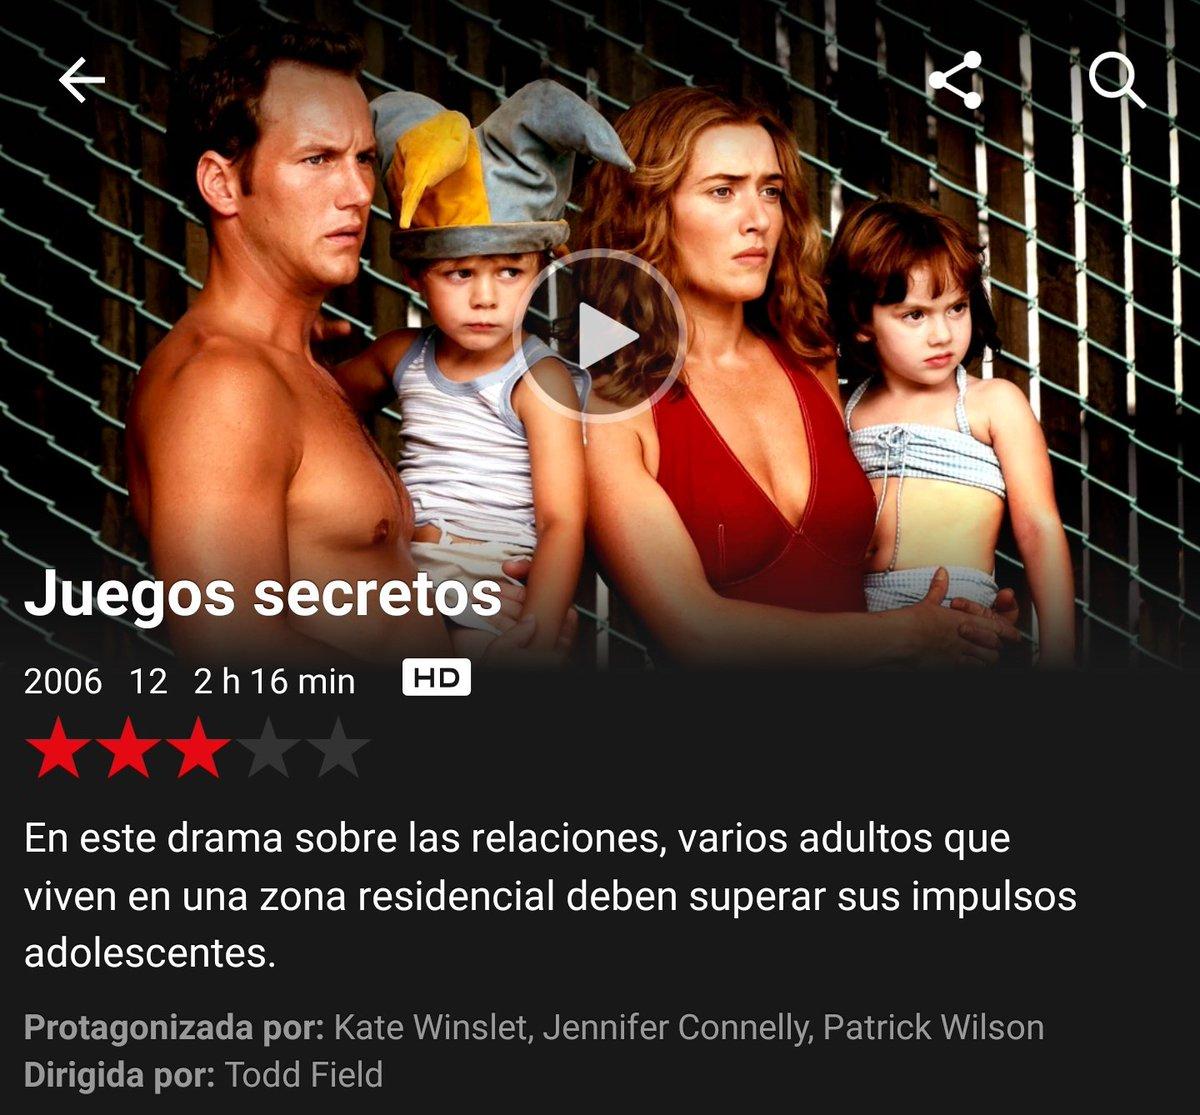 Gallo De Netflix On Twitter 31 3 17 Juegos Secretos 2006 Https